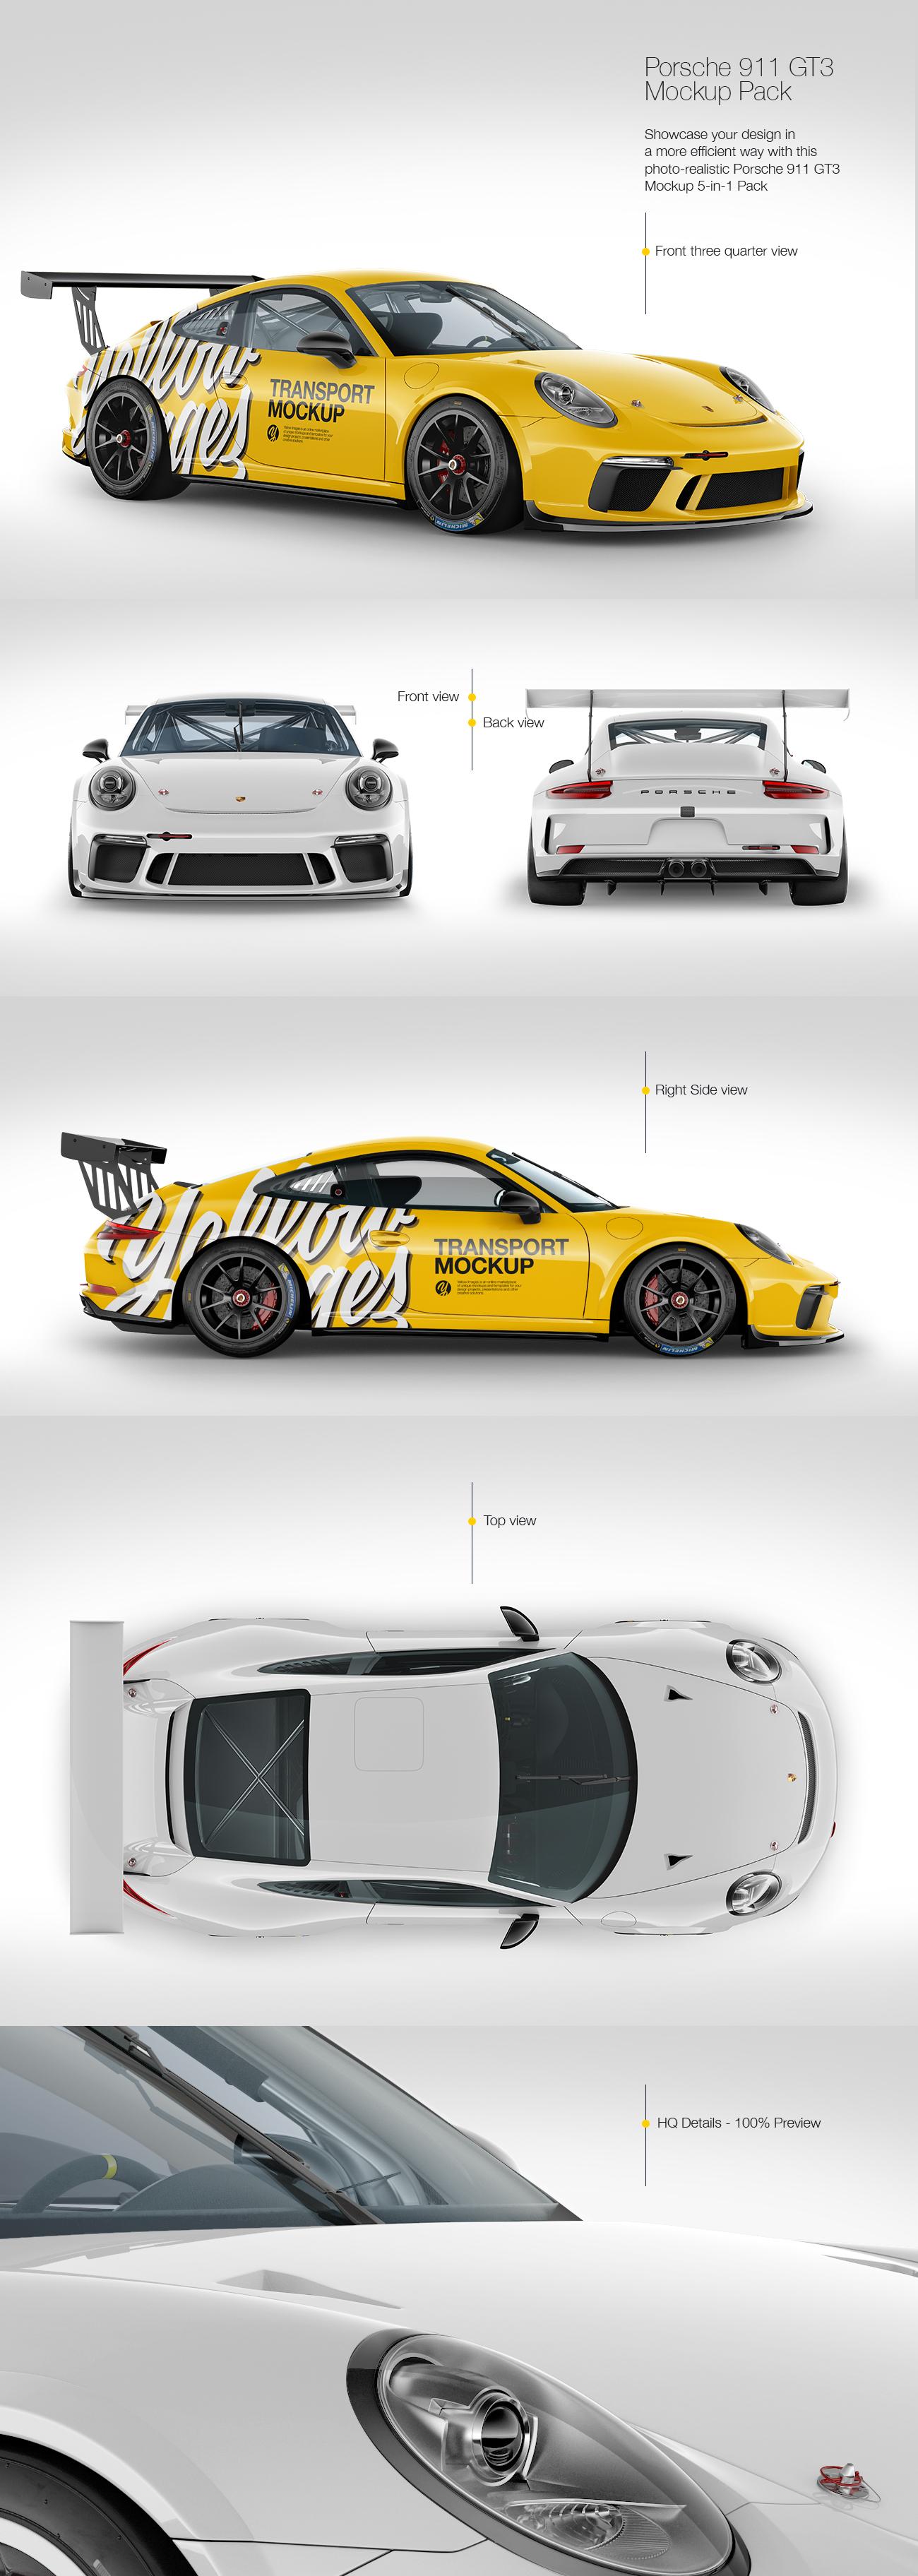 Porsche 911 GT3 Mockup Pack